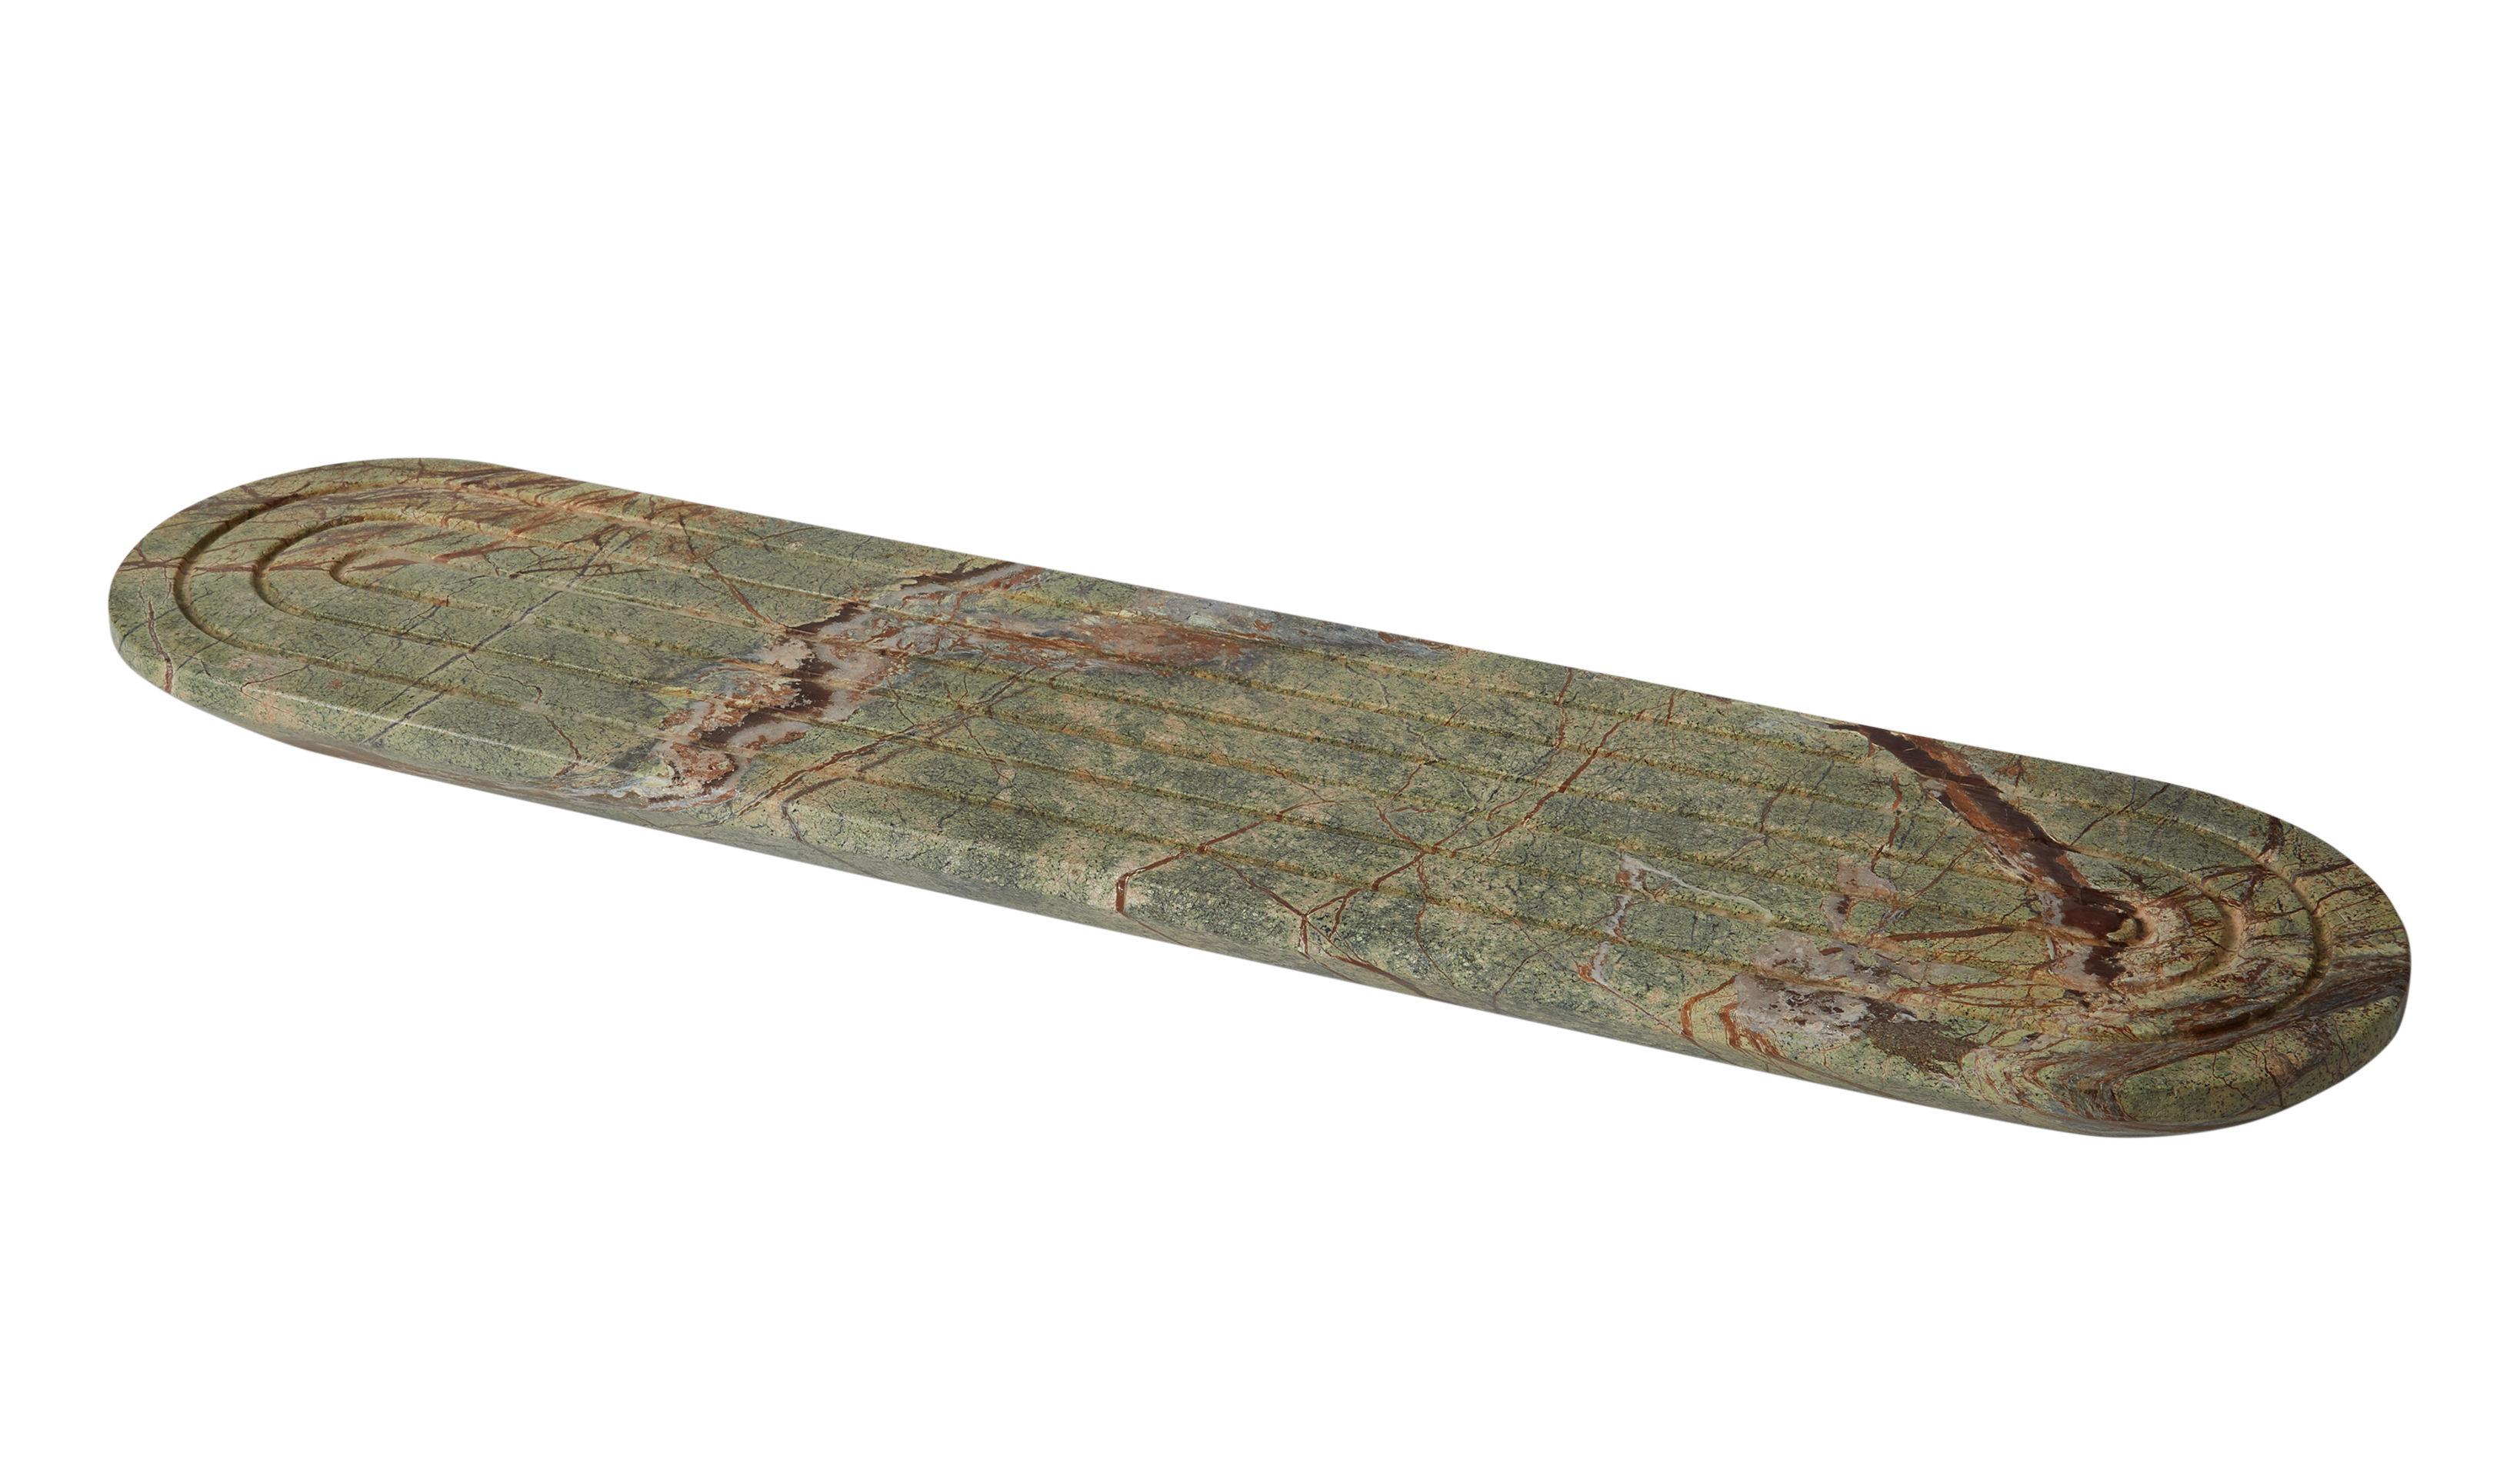 Arts de la table - Plateaux - Plateau Rock Long / Marbre - 60 x 14 cm - Tom Dixon - Long / Vert - Marbre